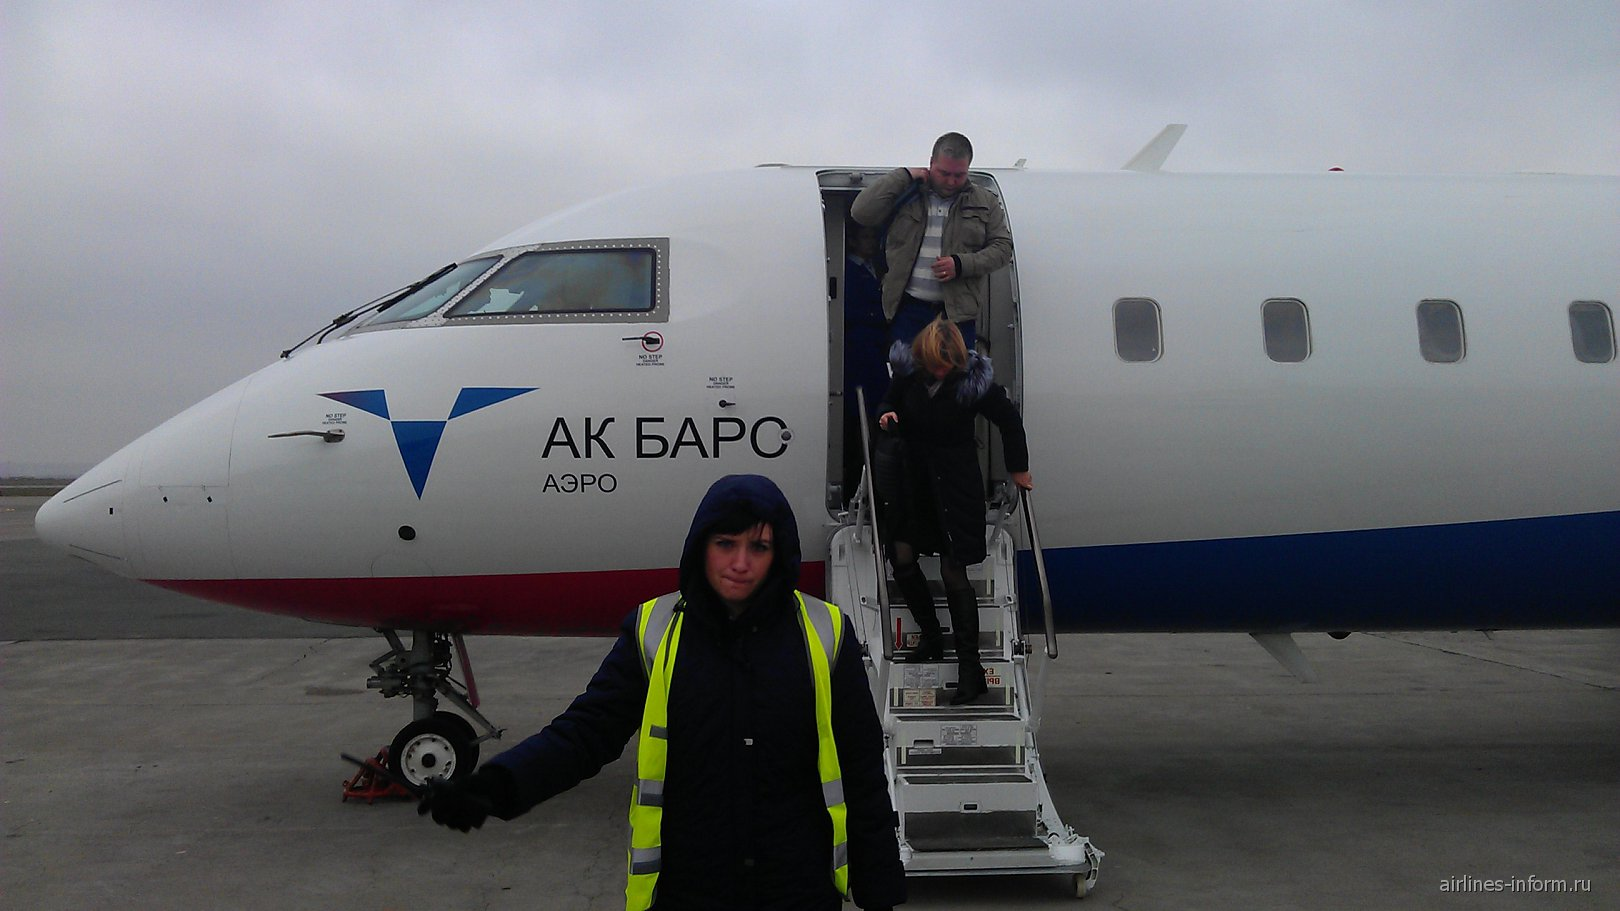 Самолет Bombardier CRJ200 авиакомпании Ак Барс Аэро в аэропорту Казани